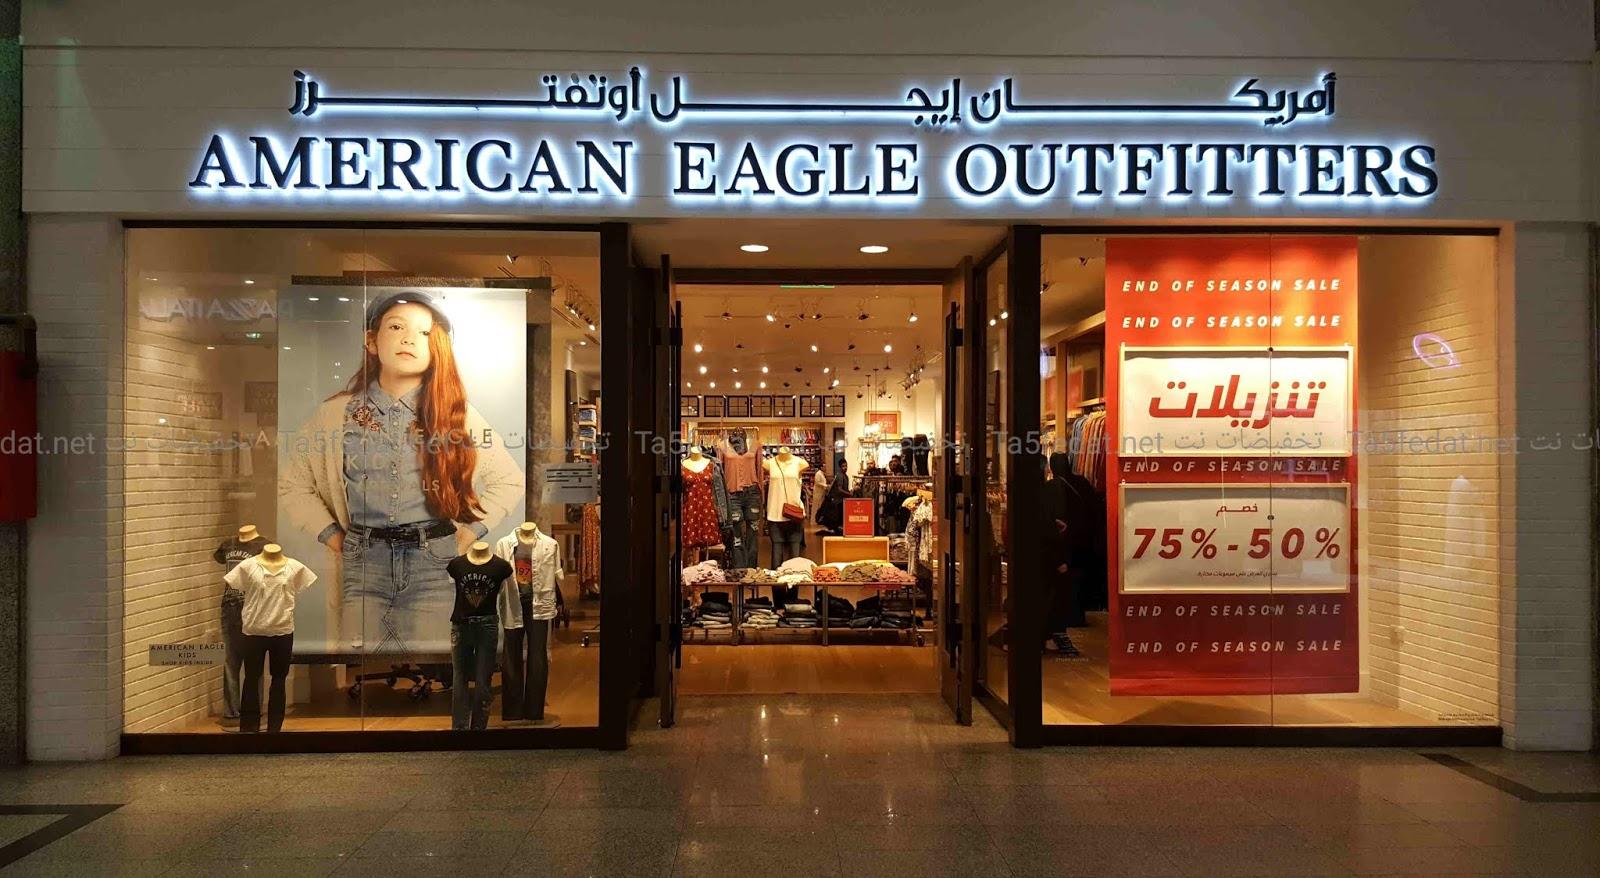 abeb860a9 تخفيضات أميريكان إيجل American Eagle للملابس الرجالية والنسائية والاطفال